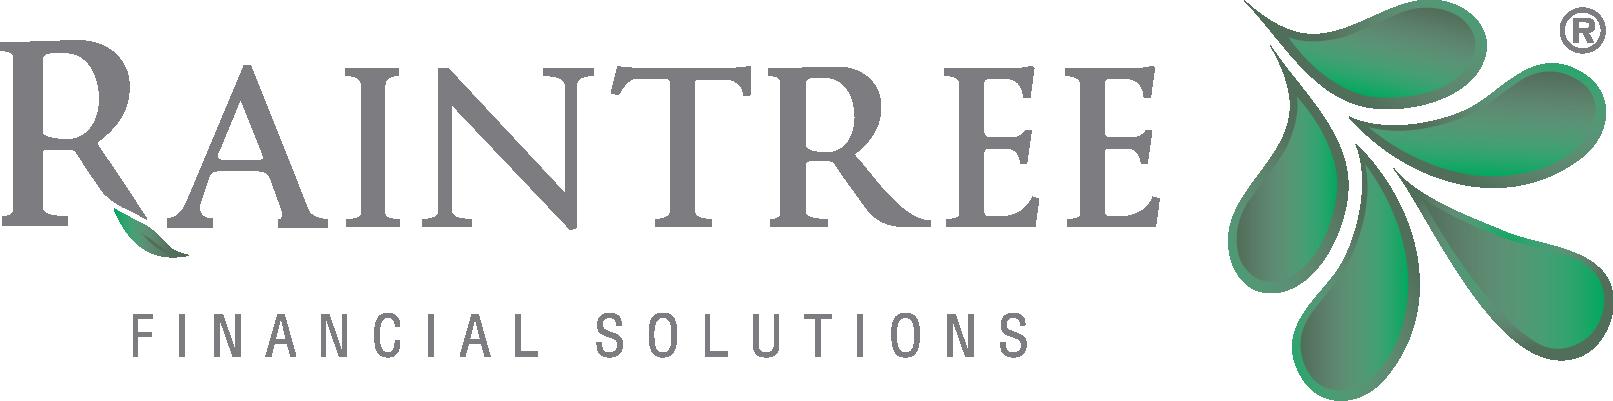 Raintree Financial Solutions